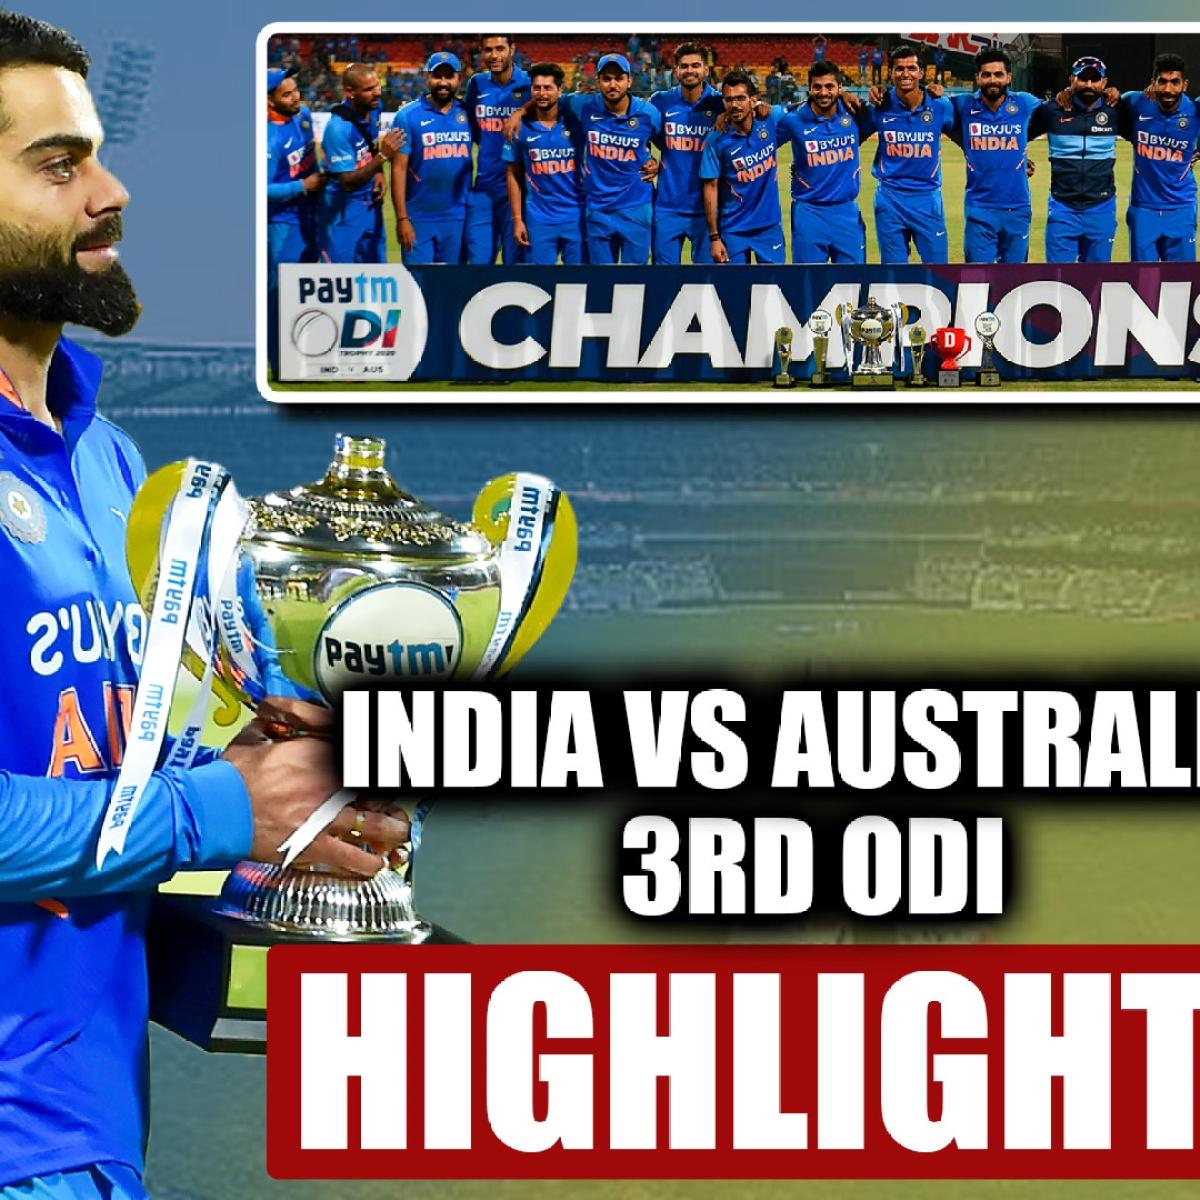 IND vs AUS 3rd ODI Highlights: Rohit, Kohli guide India to series win over Australia